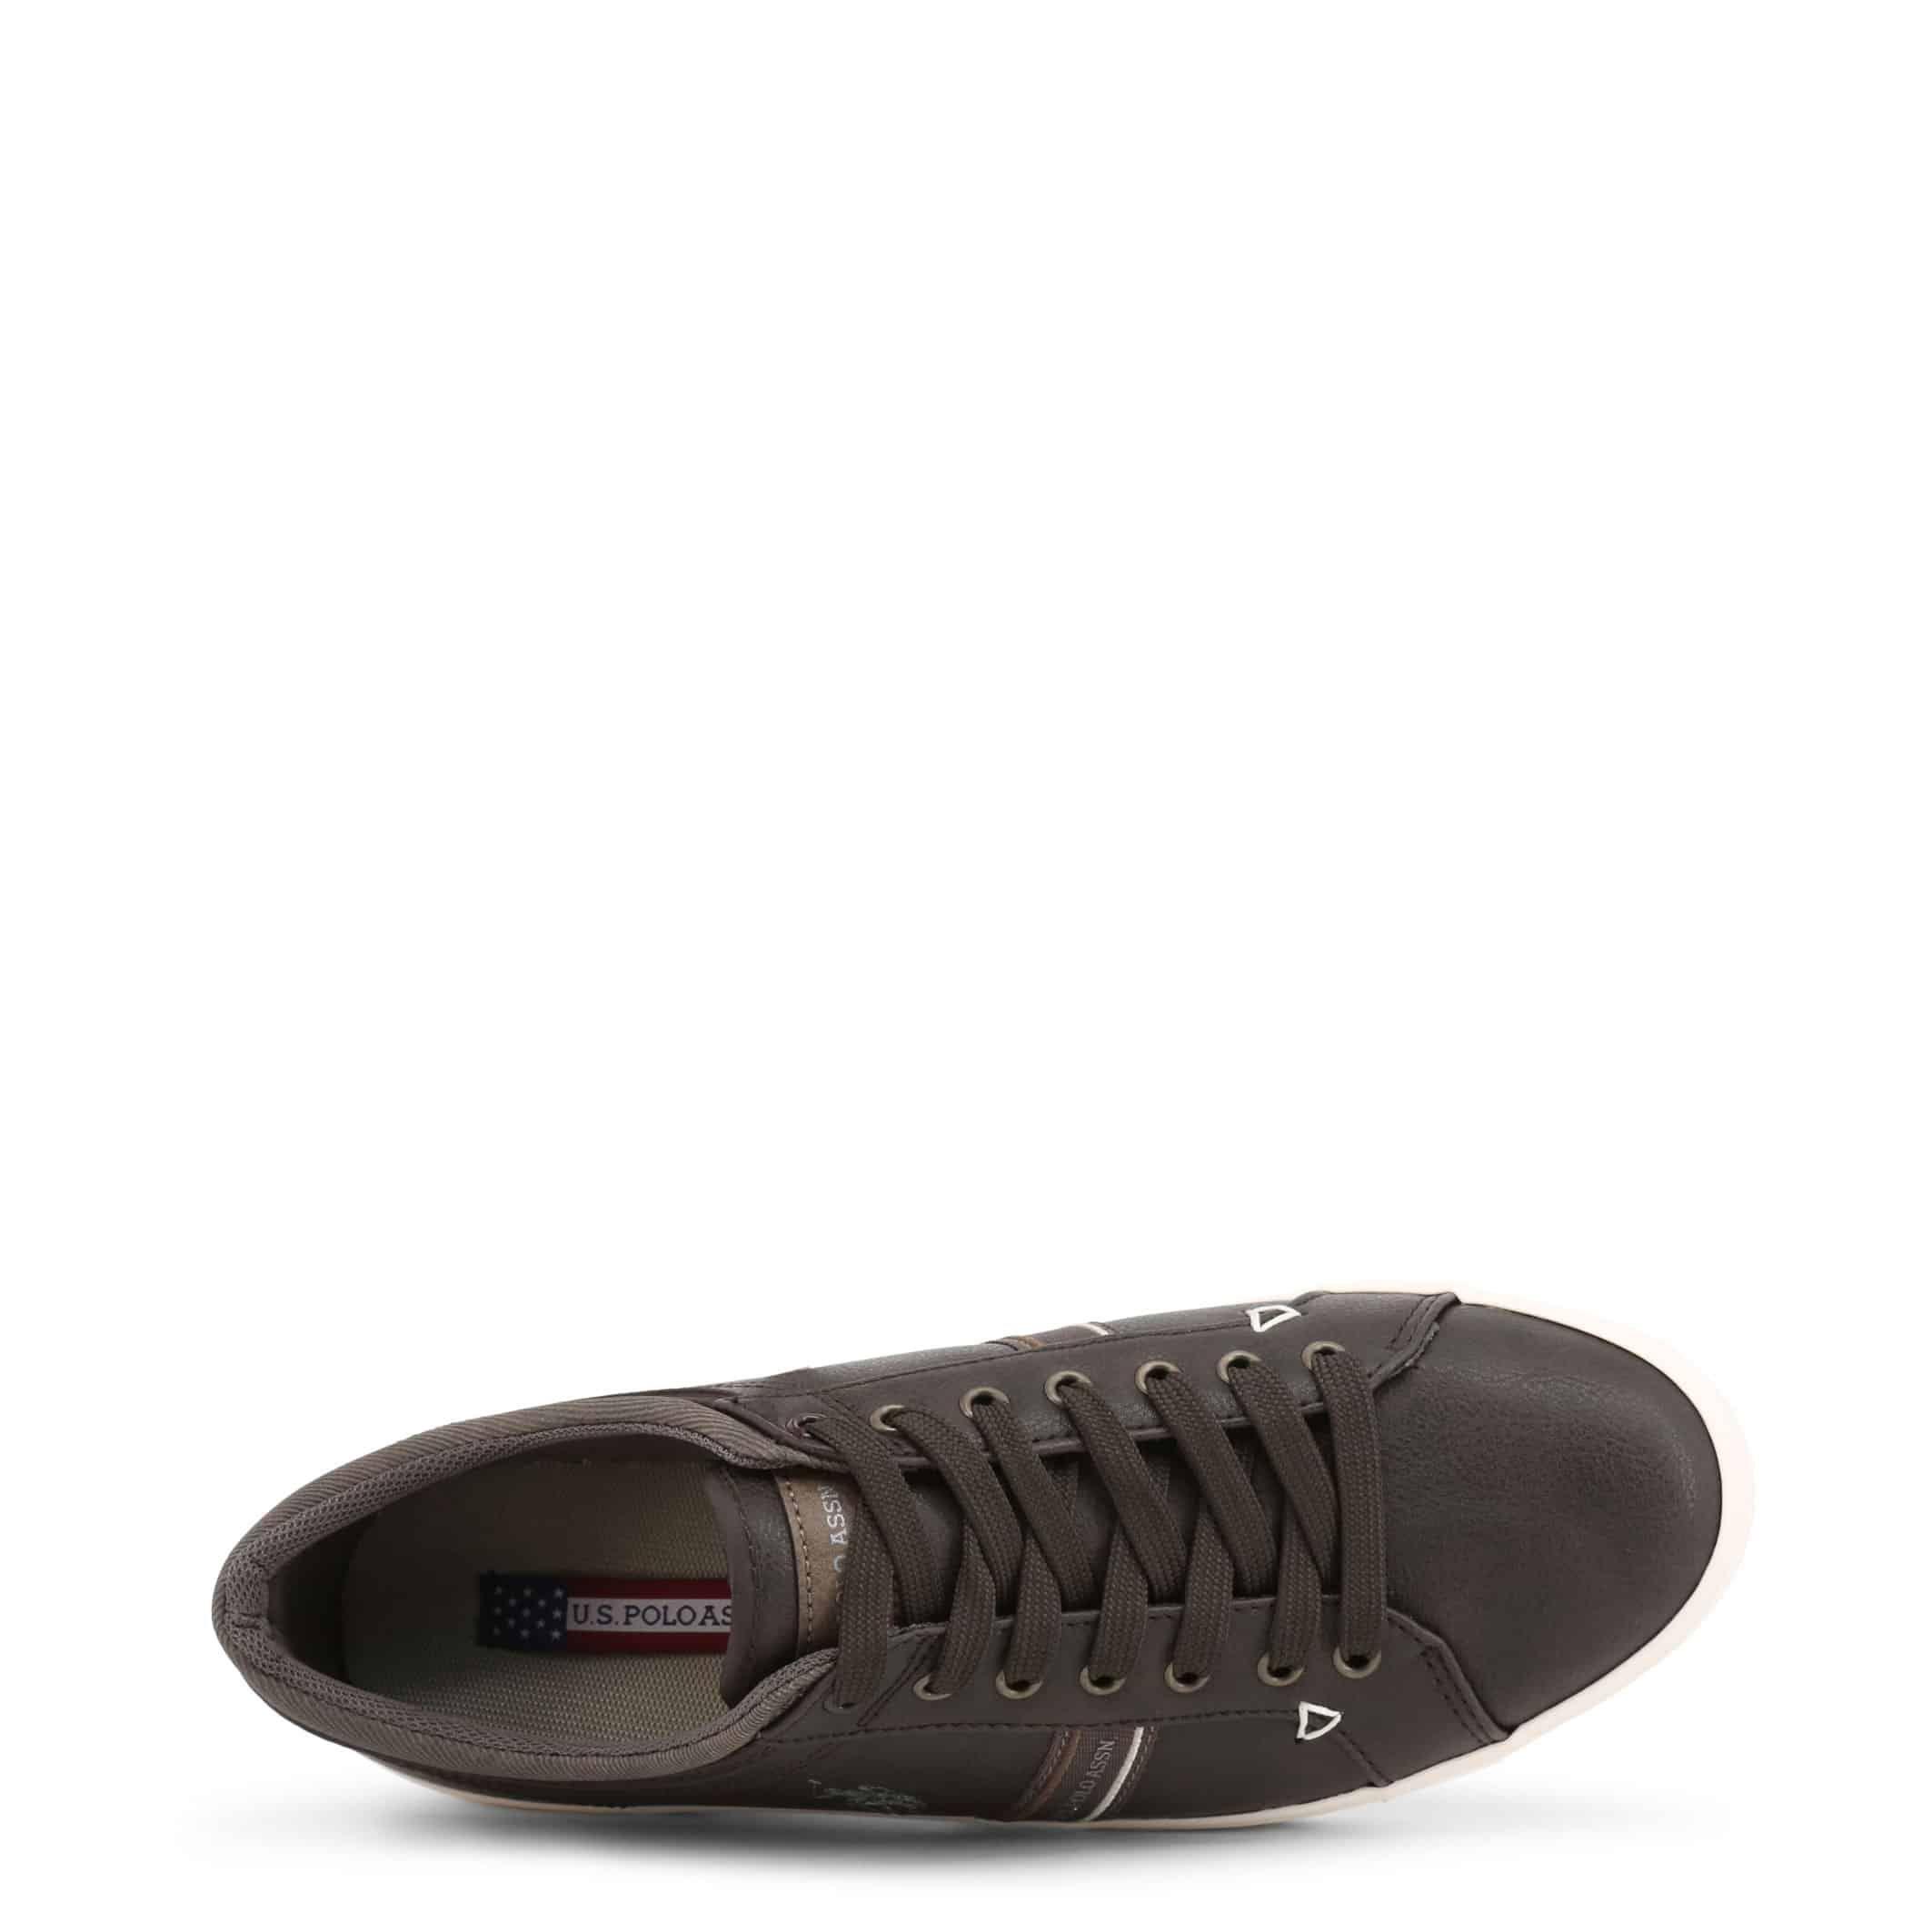 Sneakers U.S. Polo Assn. – WOUCK7108W8